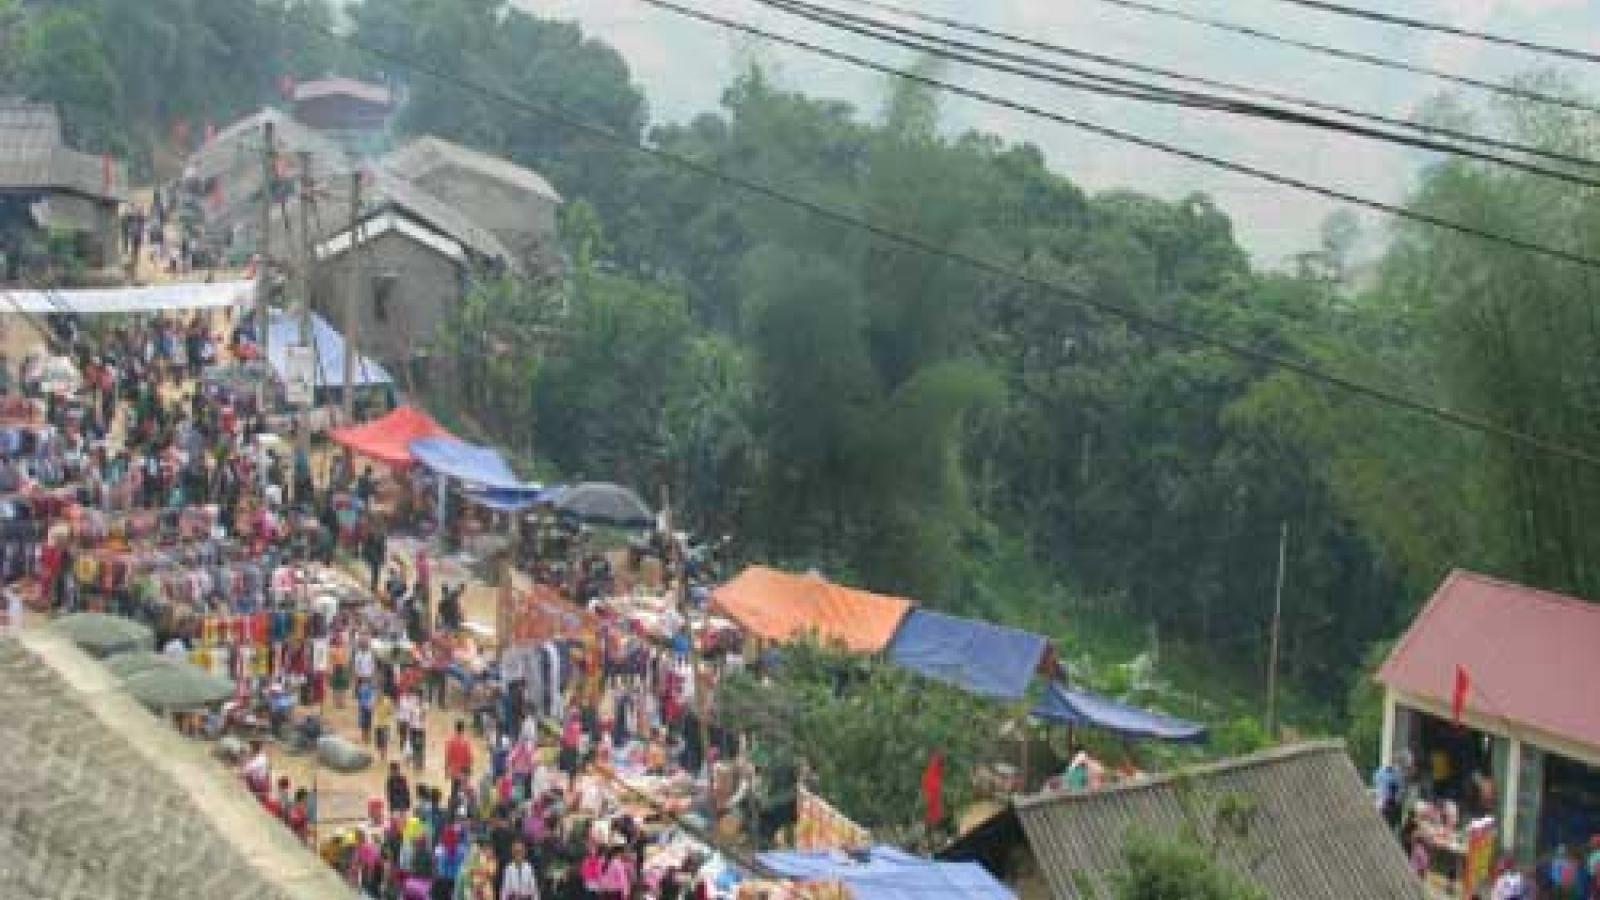 Khau Vai Love Market to attract visitors to Ha Giang